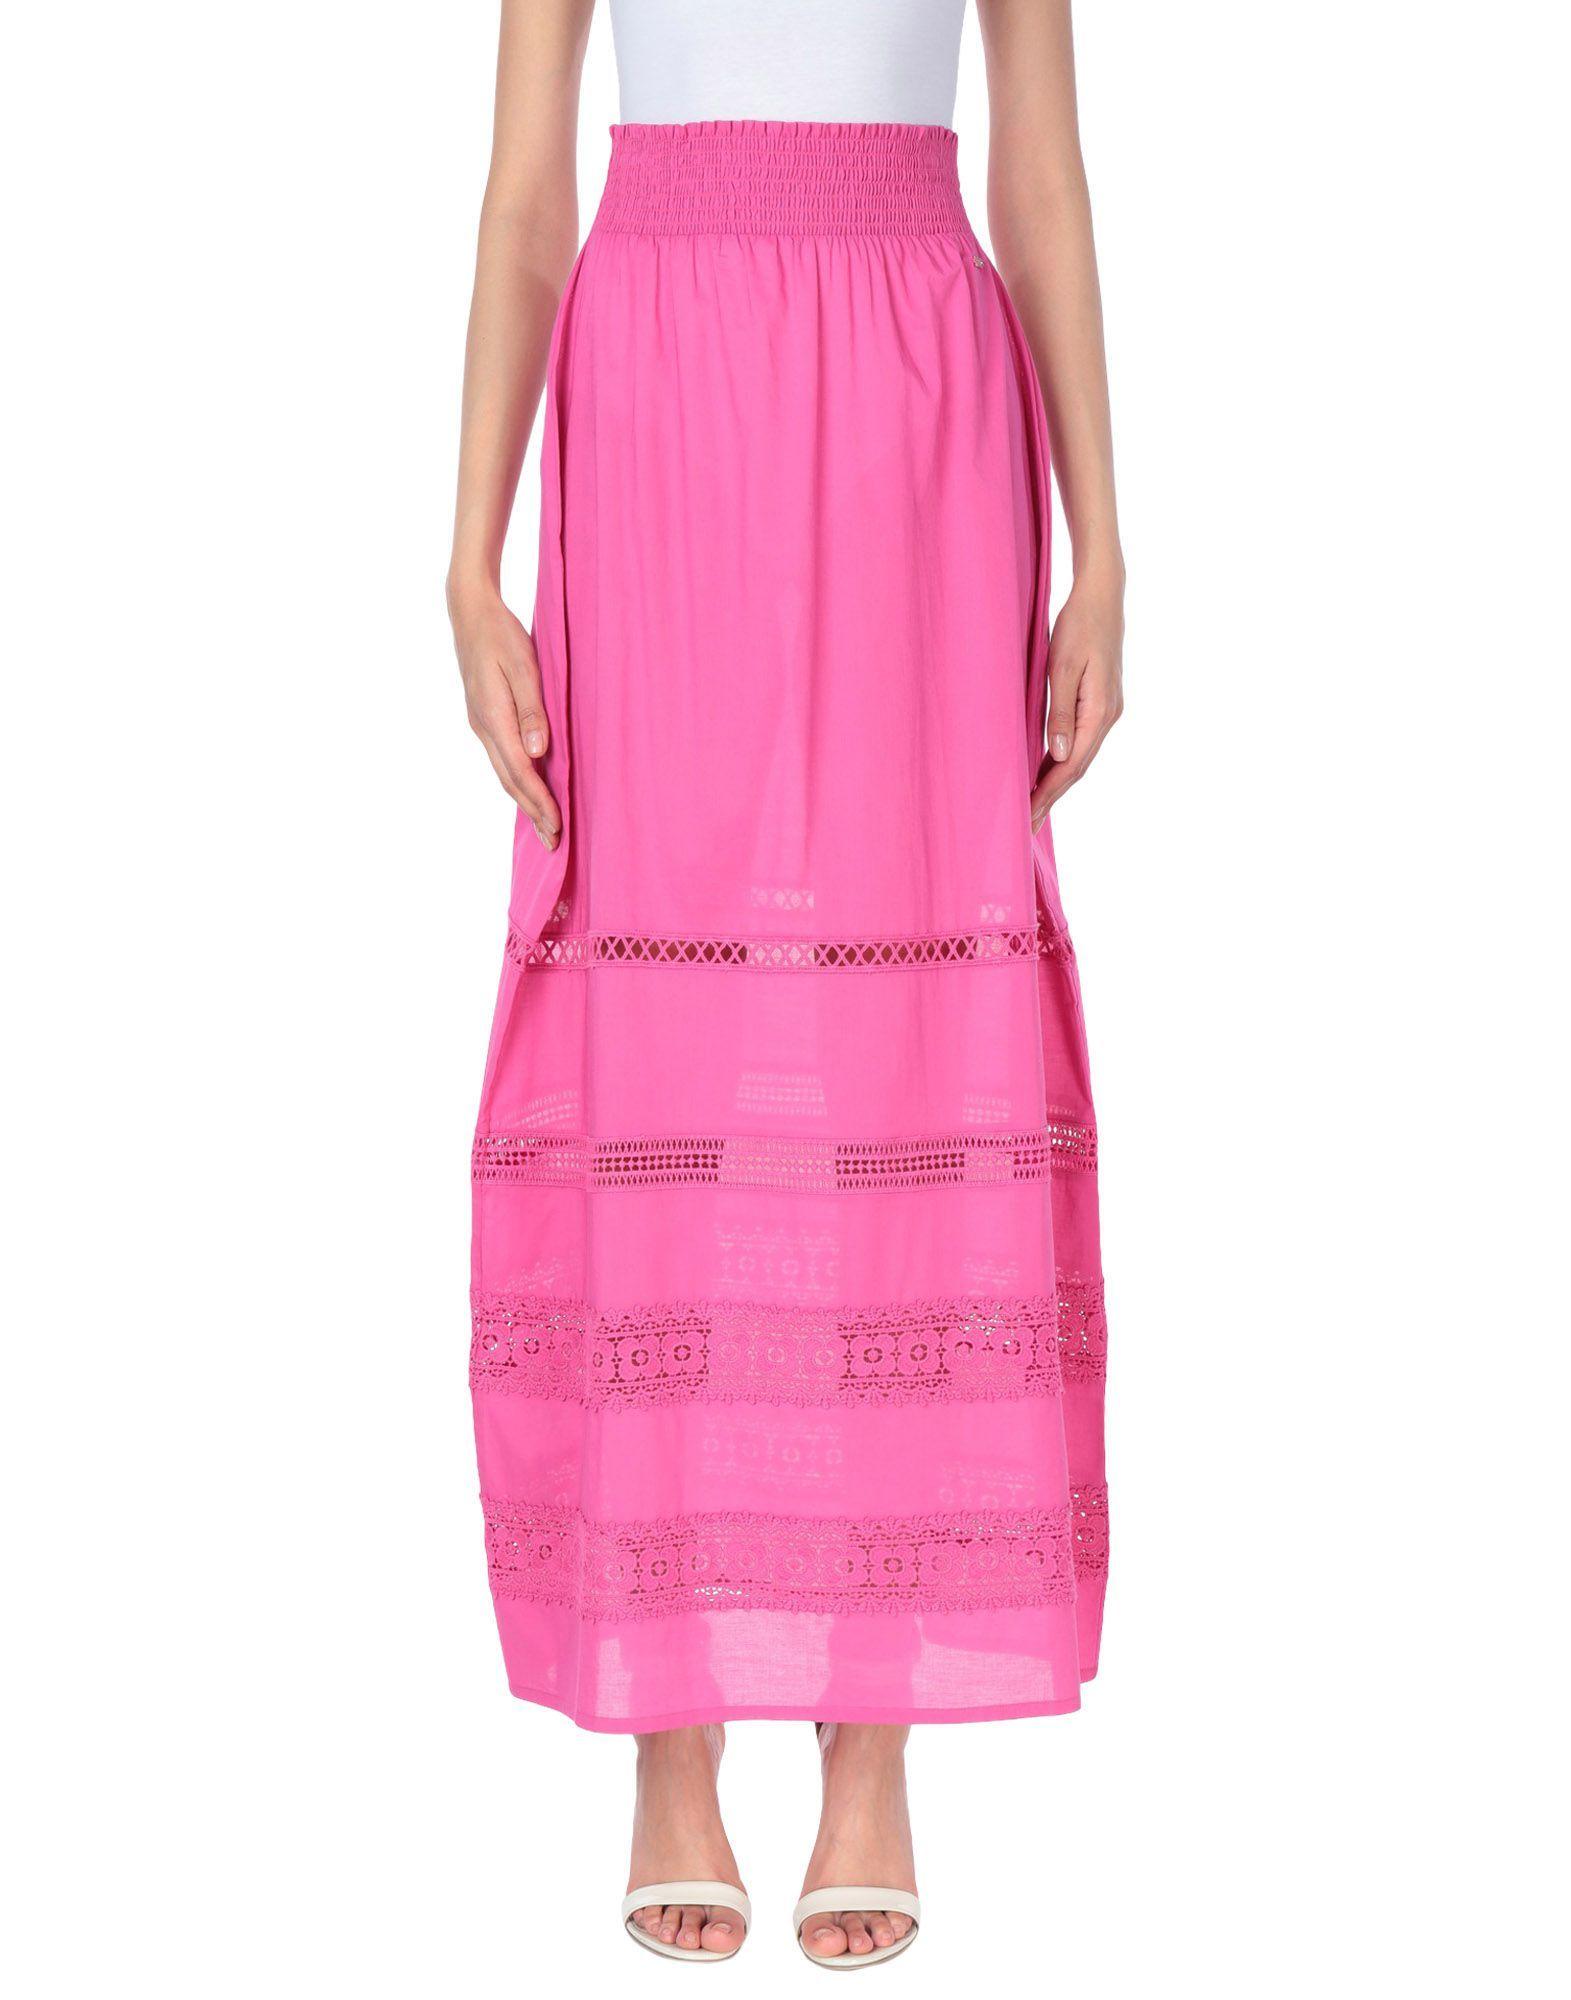 Liu Jo Fuchsia Cotton Full Length Skirt